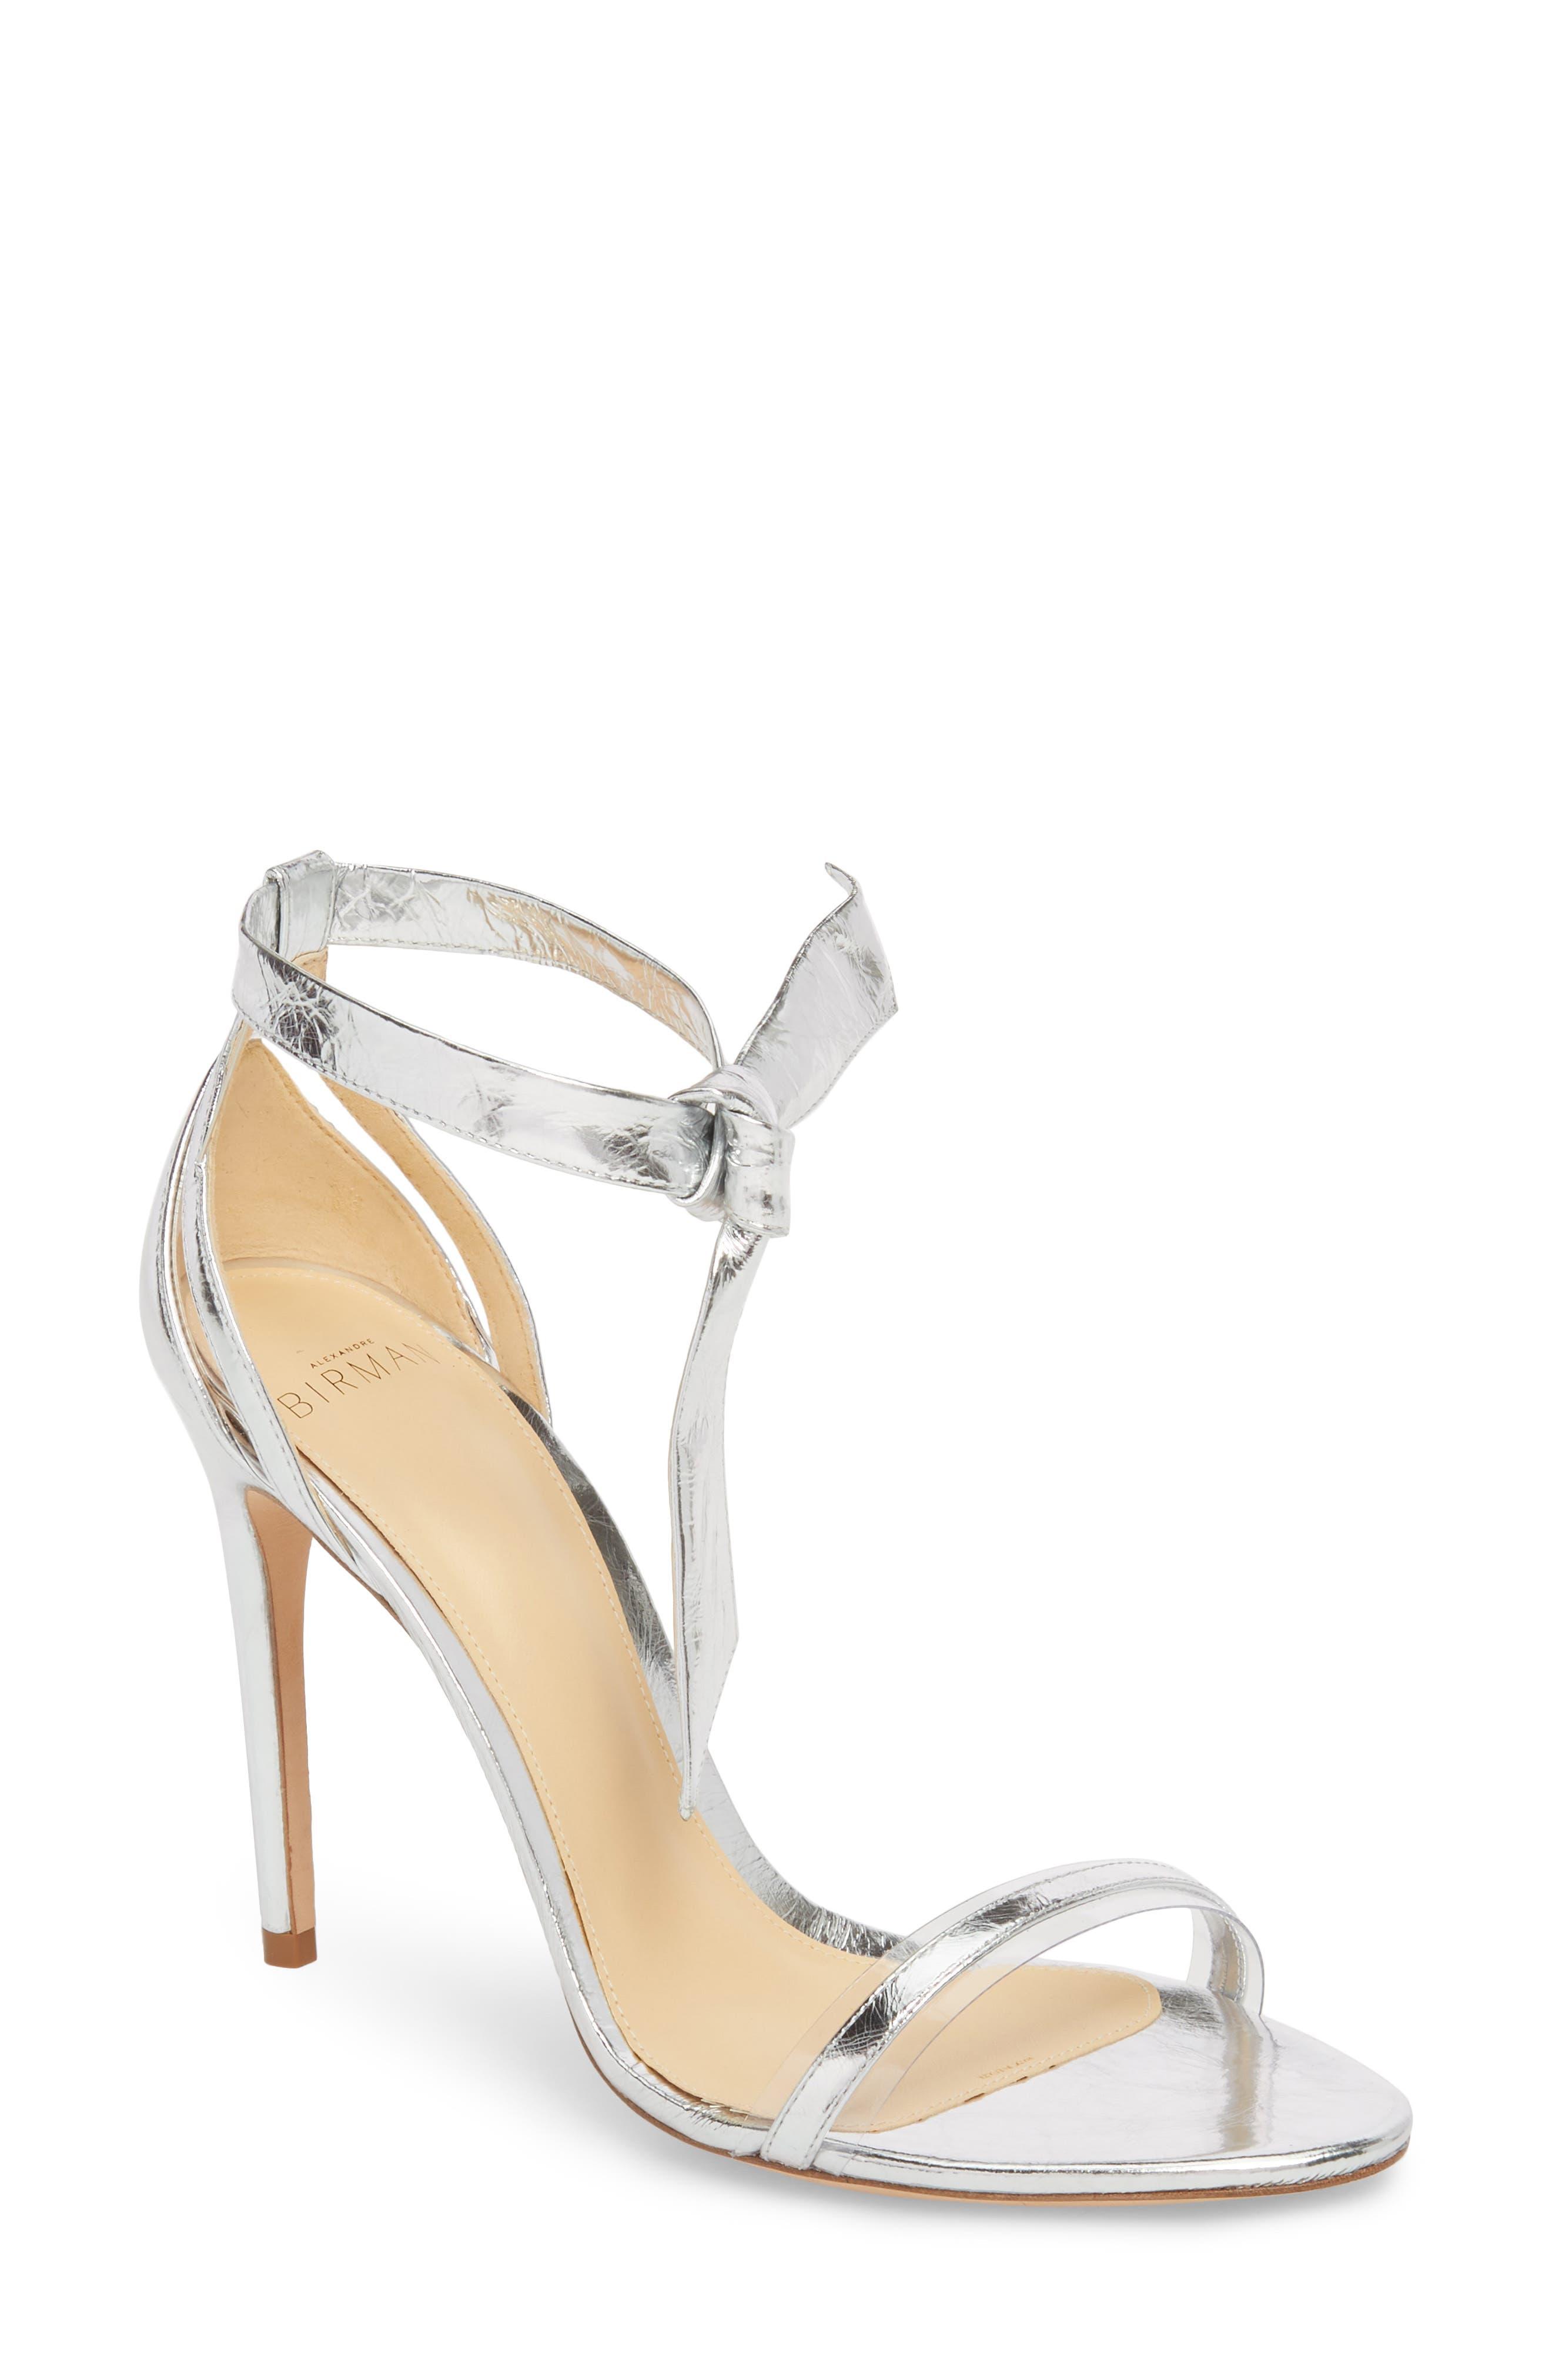 Clarita Sandal,                         Main,                         color, Silver/ Transparent